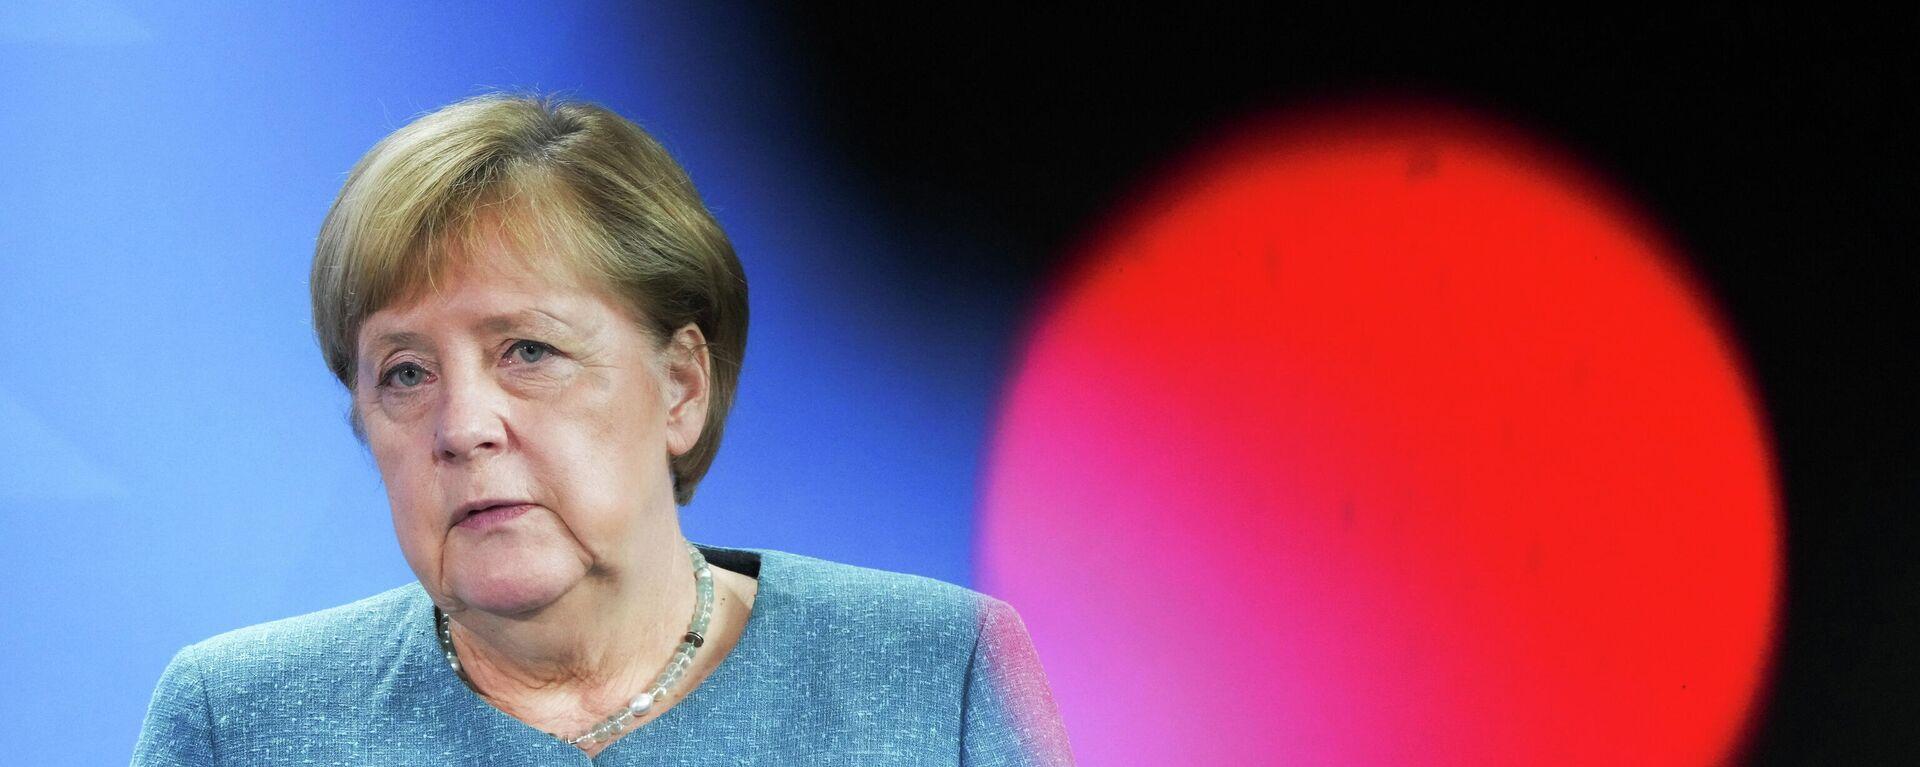 Angela Merkel - SNA, 1920, 31.08.2021